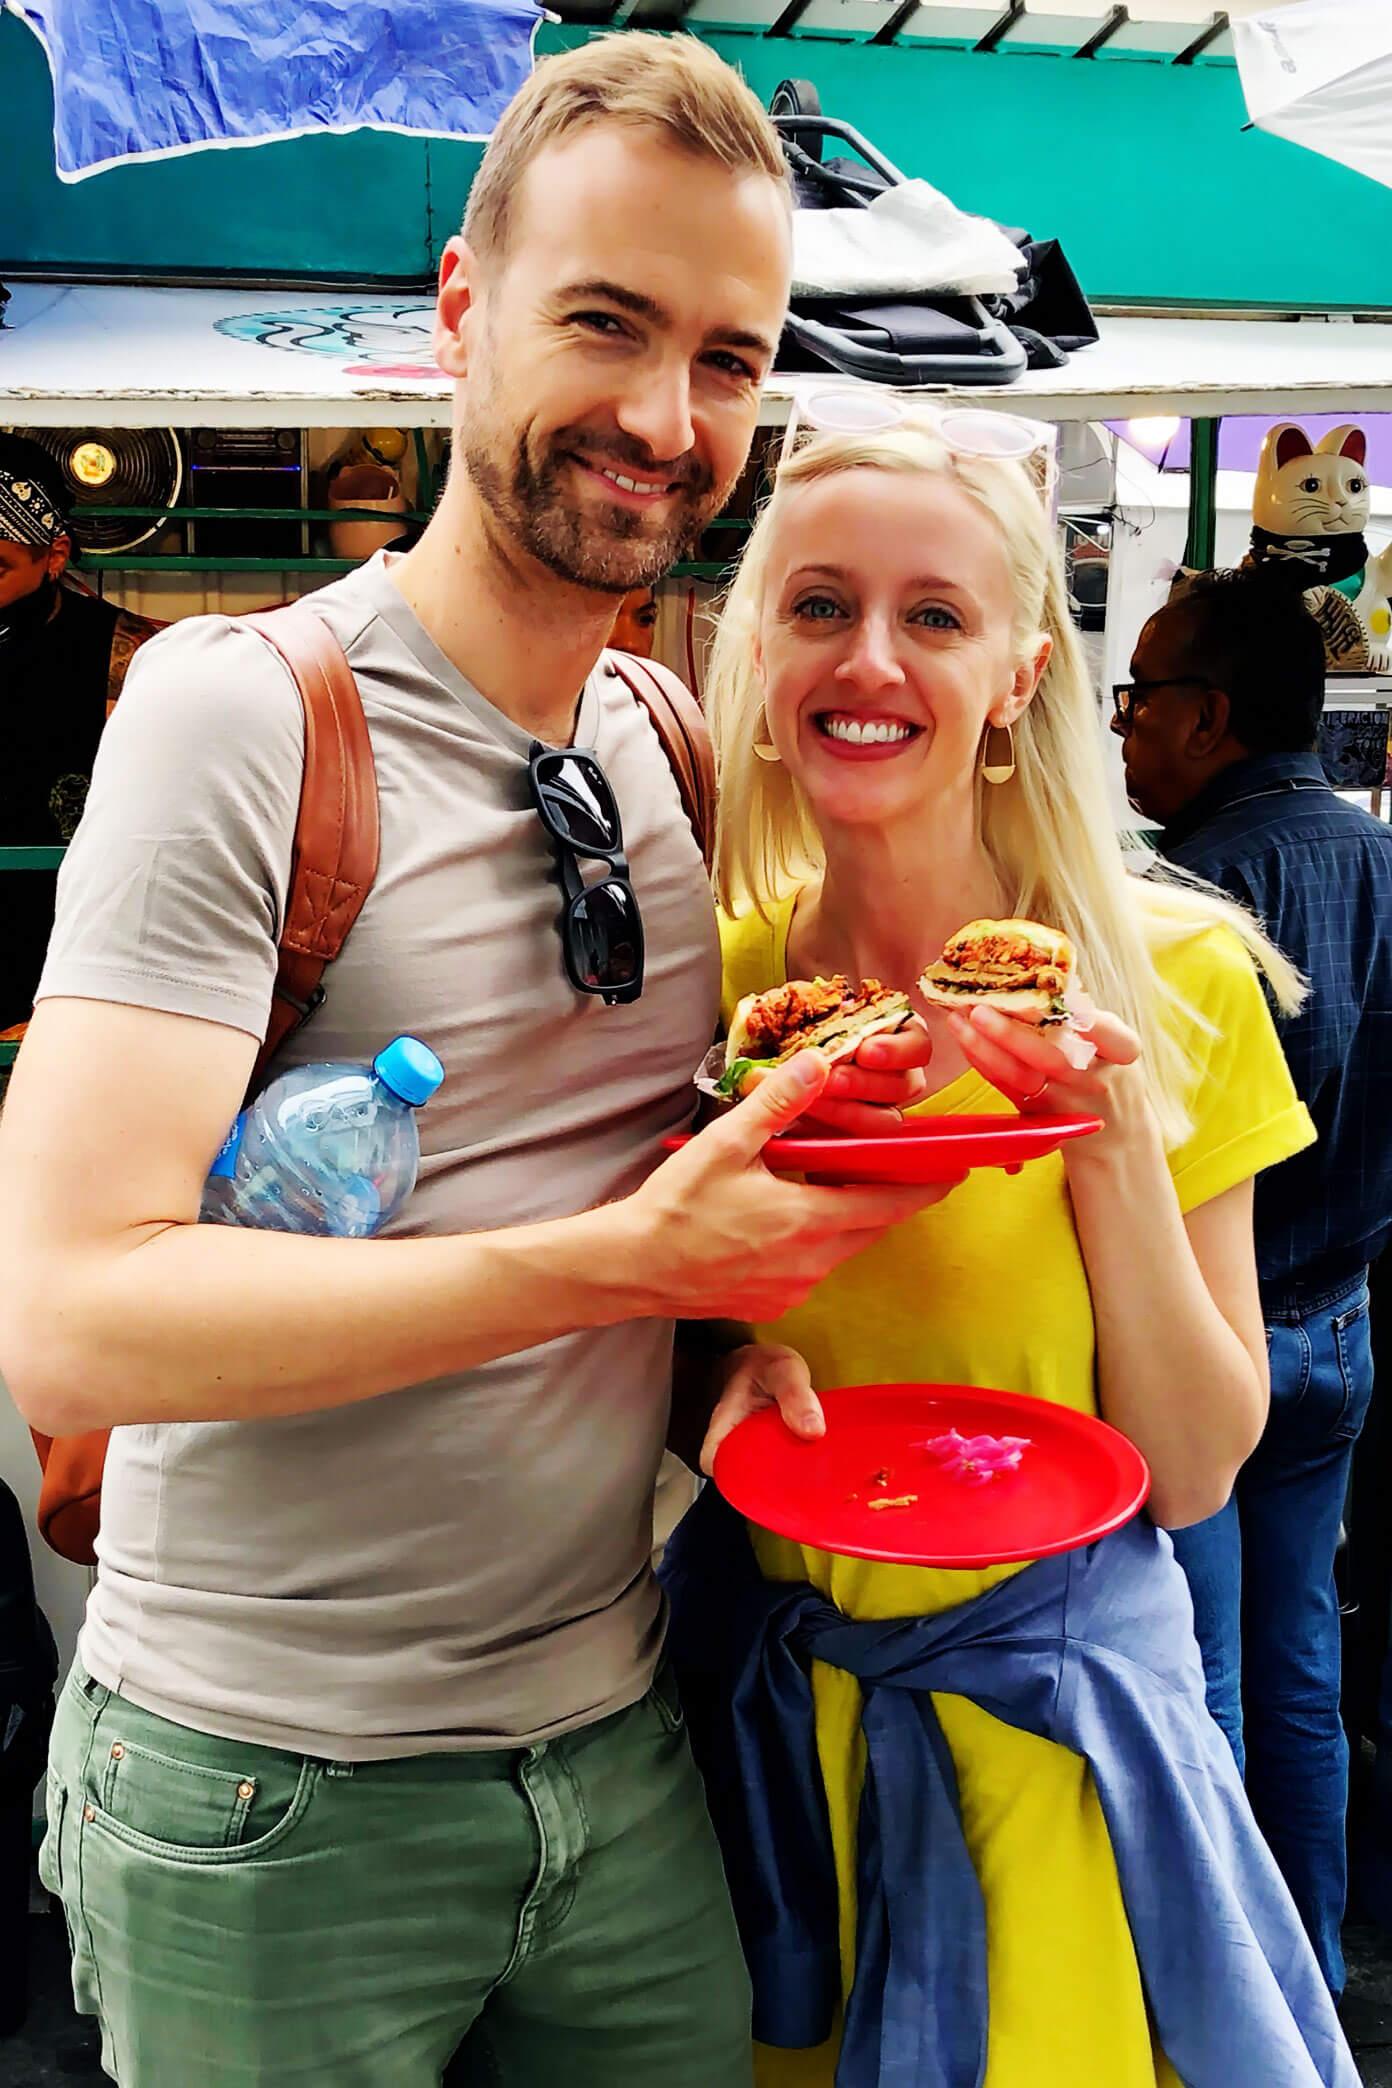 Vegan Food in Mexico City | Barclay and Ali Martin | Ali's Guide To CDMX